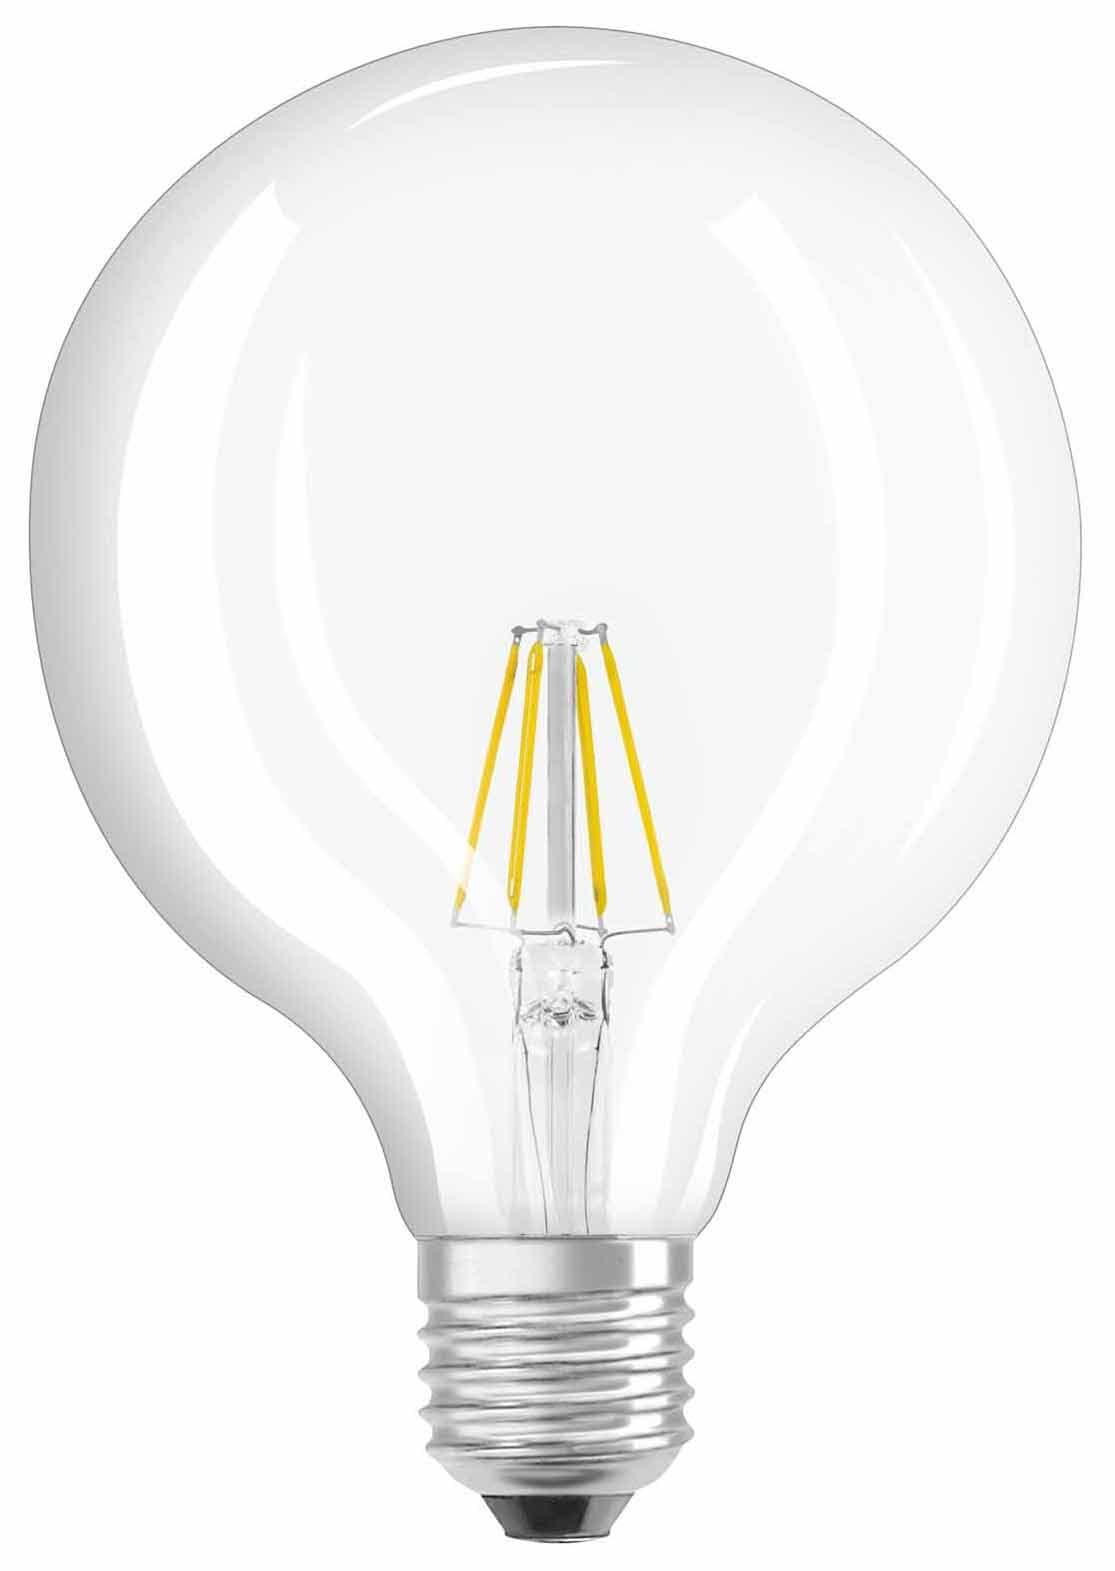 osram led e27 60w filament globe cl migros. Black Bedroom Furniture Sets. Home Design Ideas